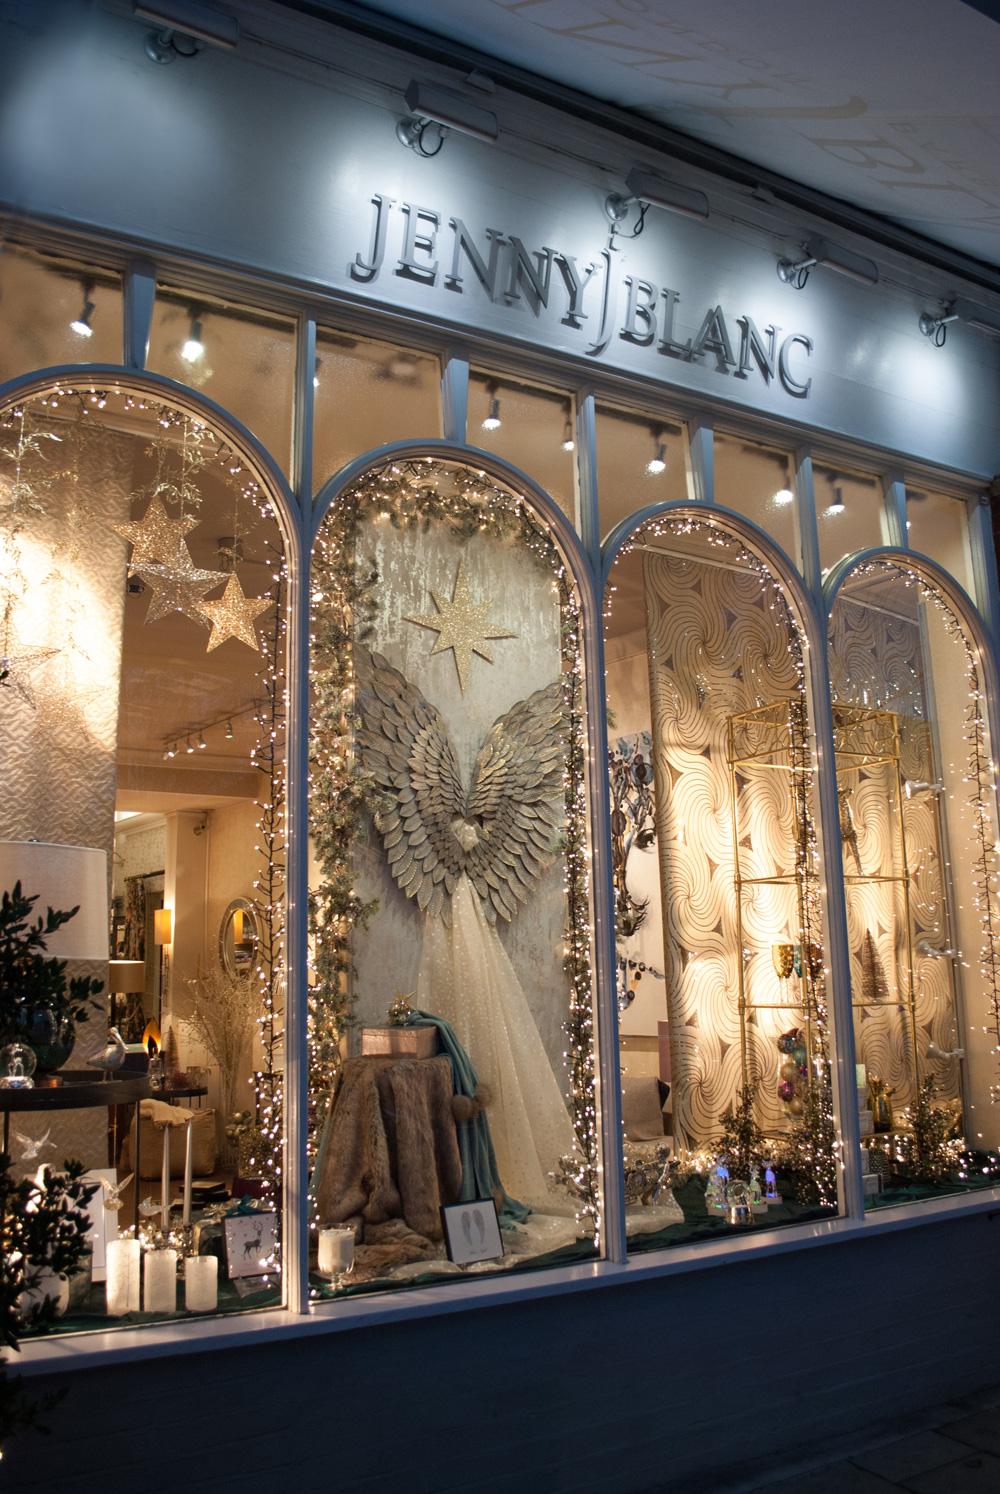 Jenny Blanc - London Showroom Christmas Window Display Image 3